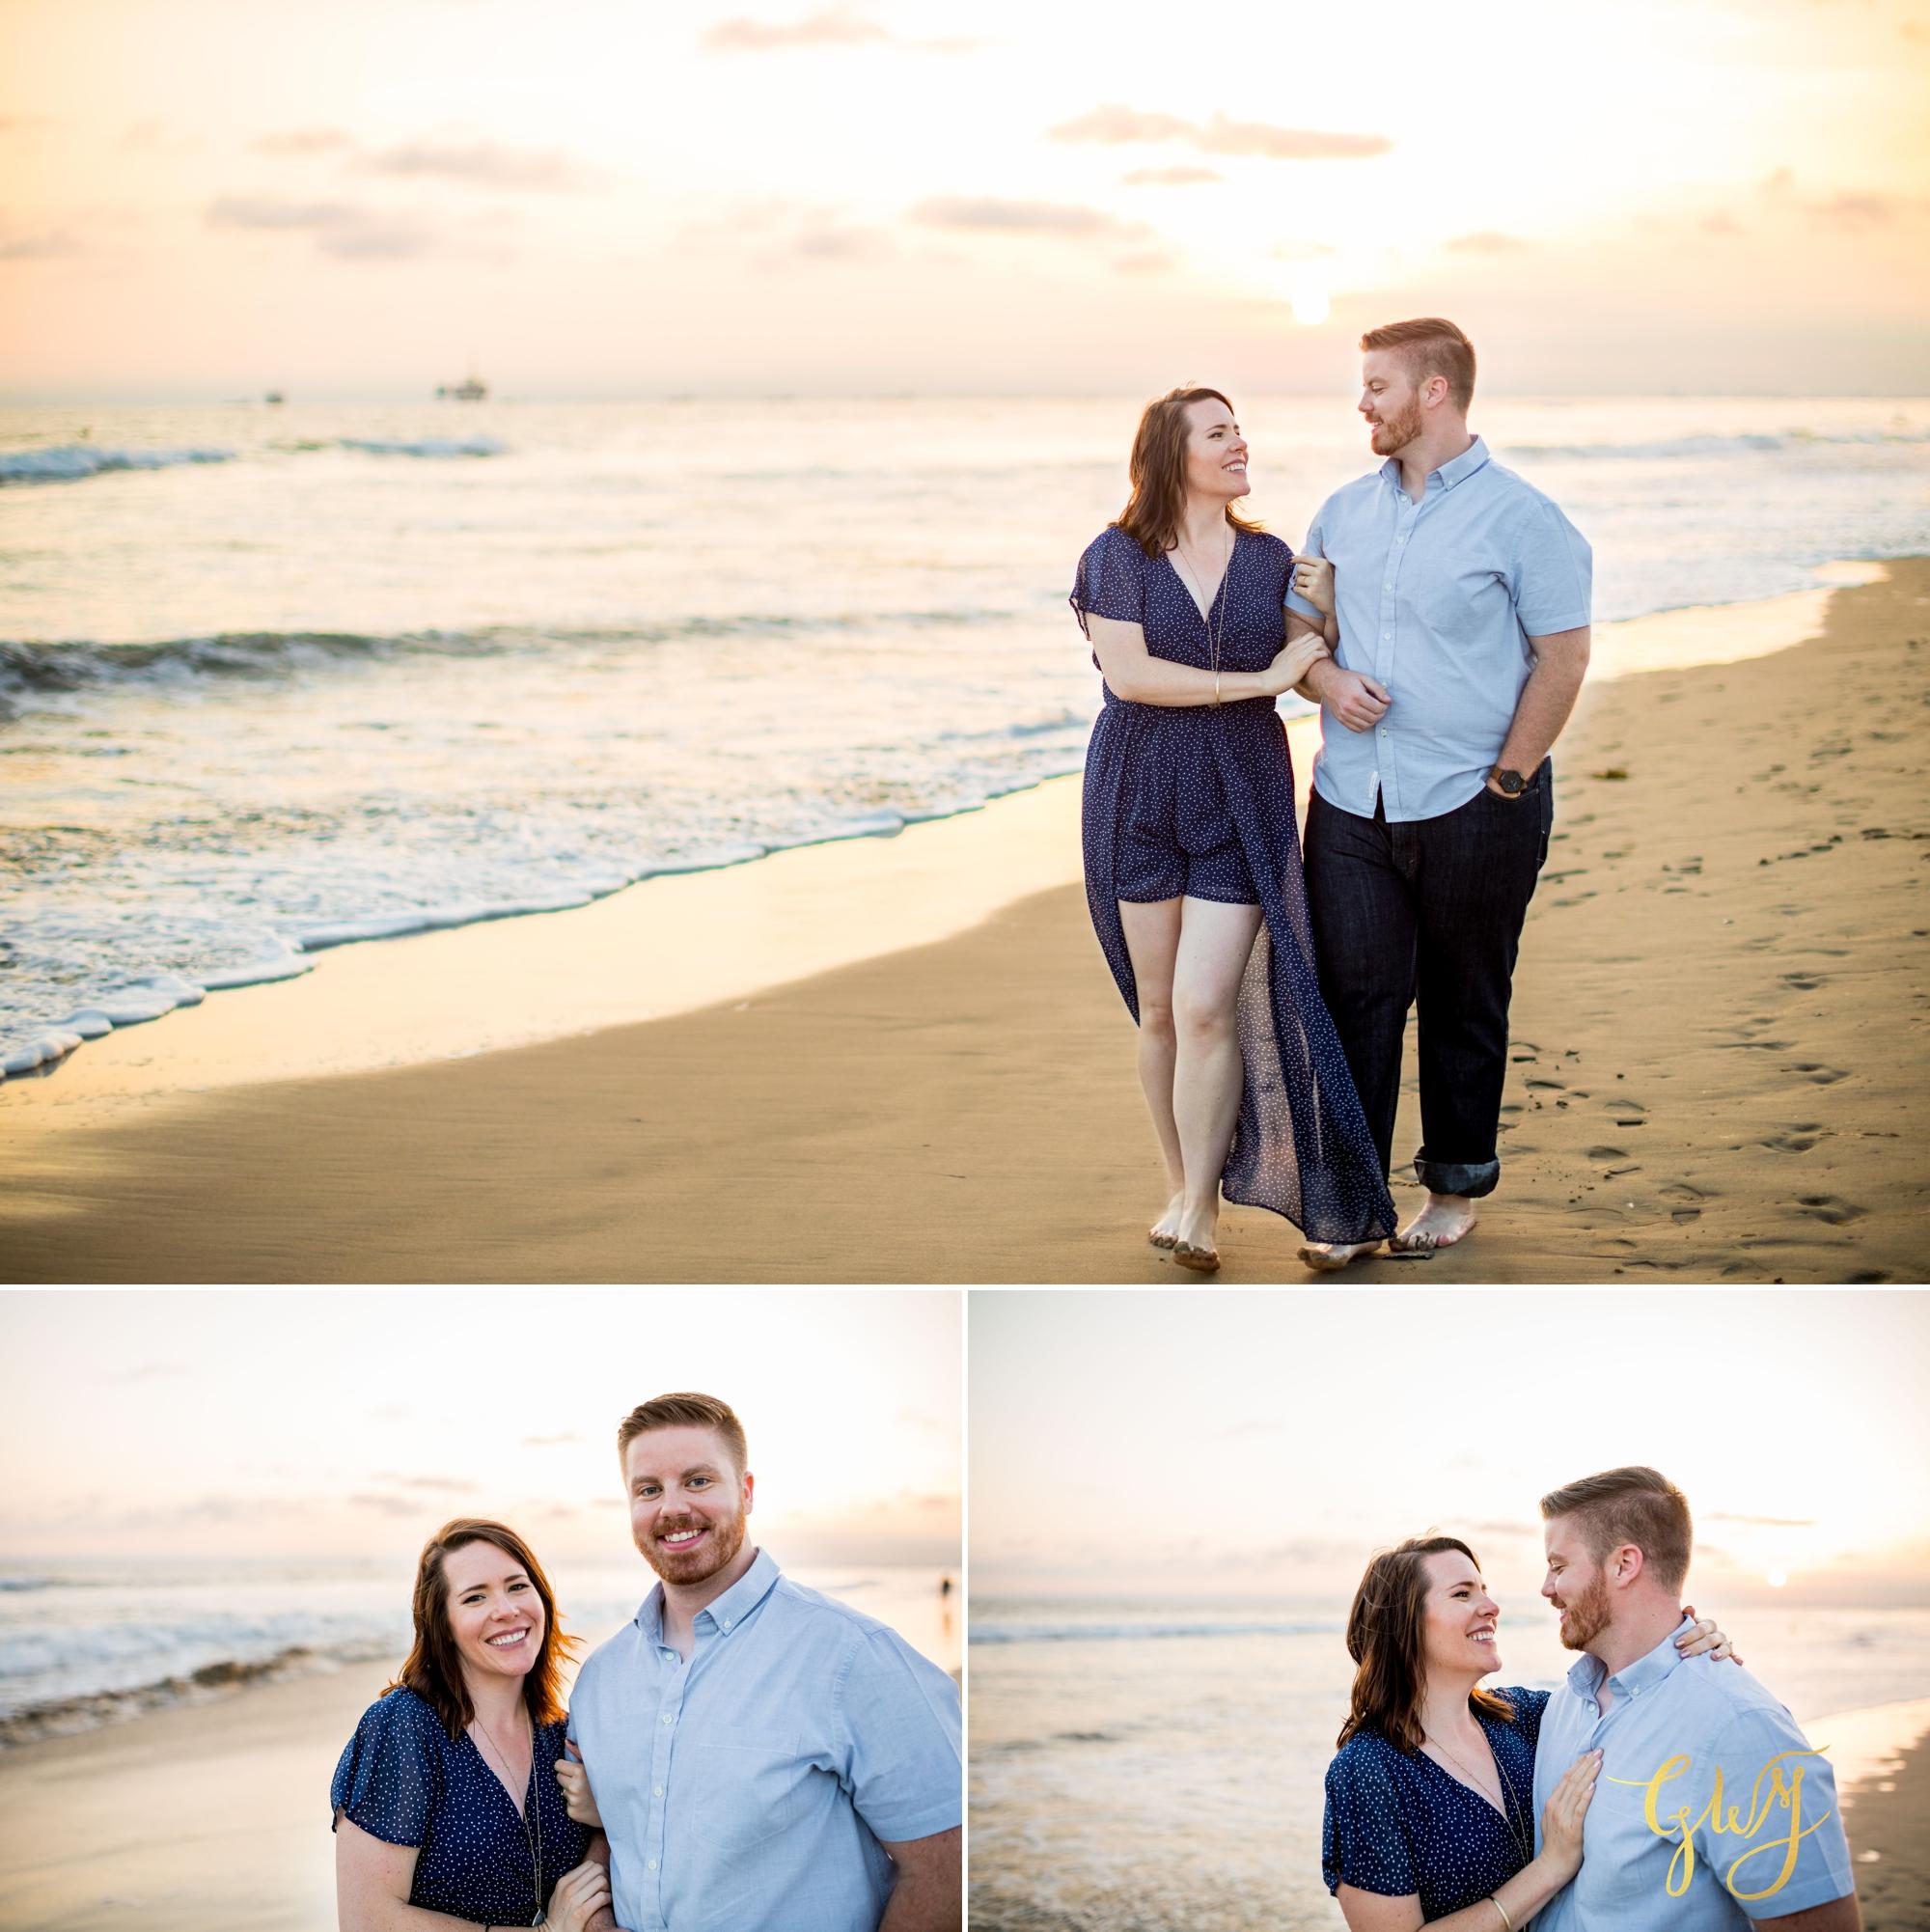 Cristina + David's Huntington Beach Central Park Romantic Sunset Engagement Session by Glass Woods Media 16.jpg